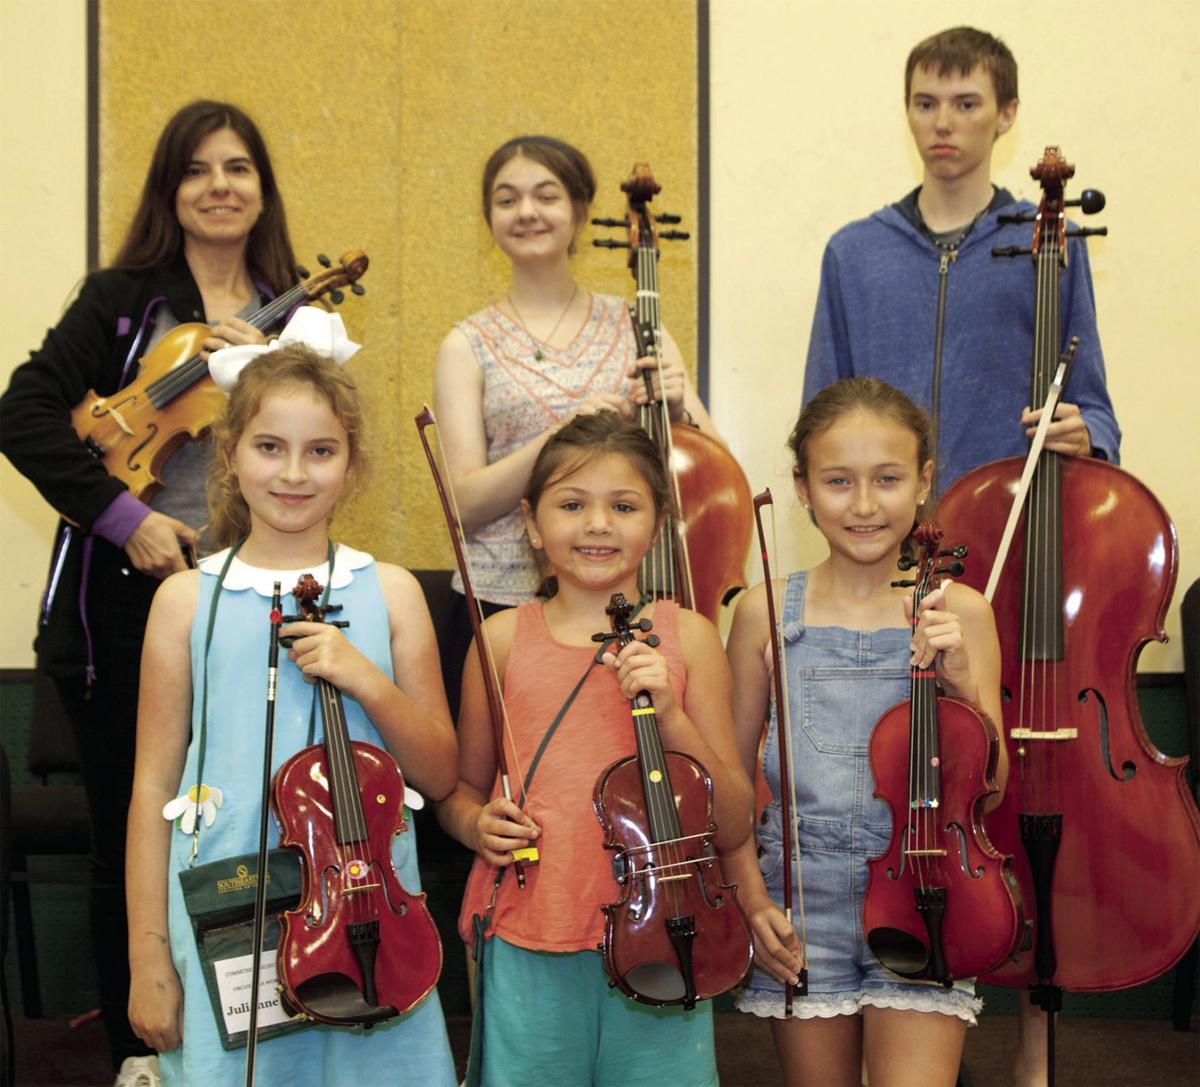 Southeastern Louisiana University hosts music camps